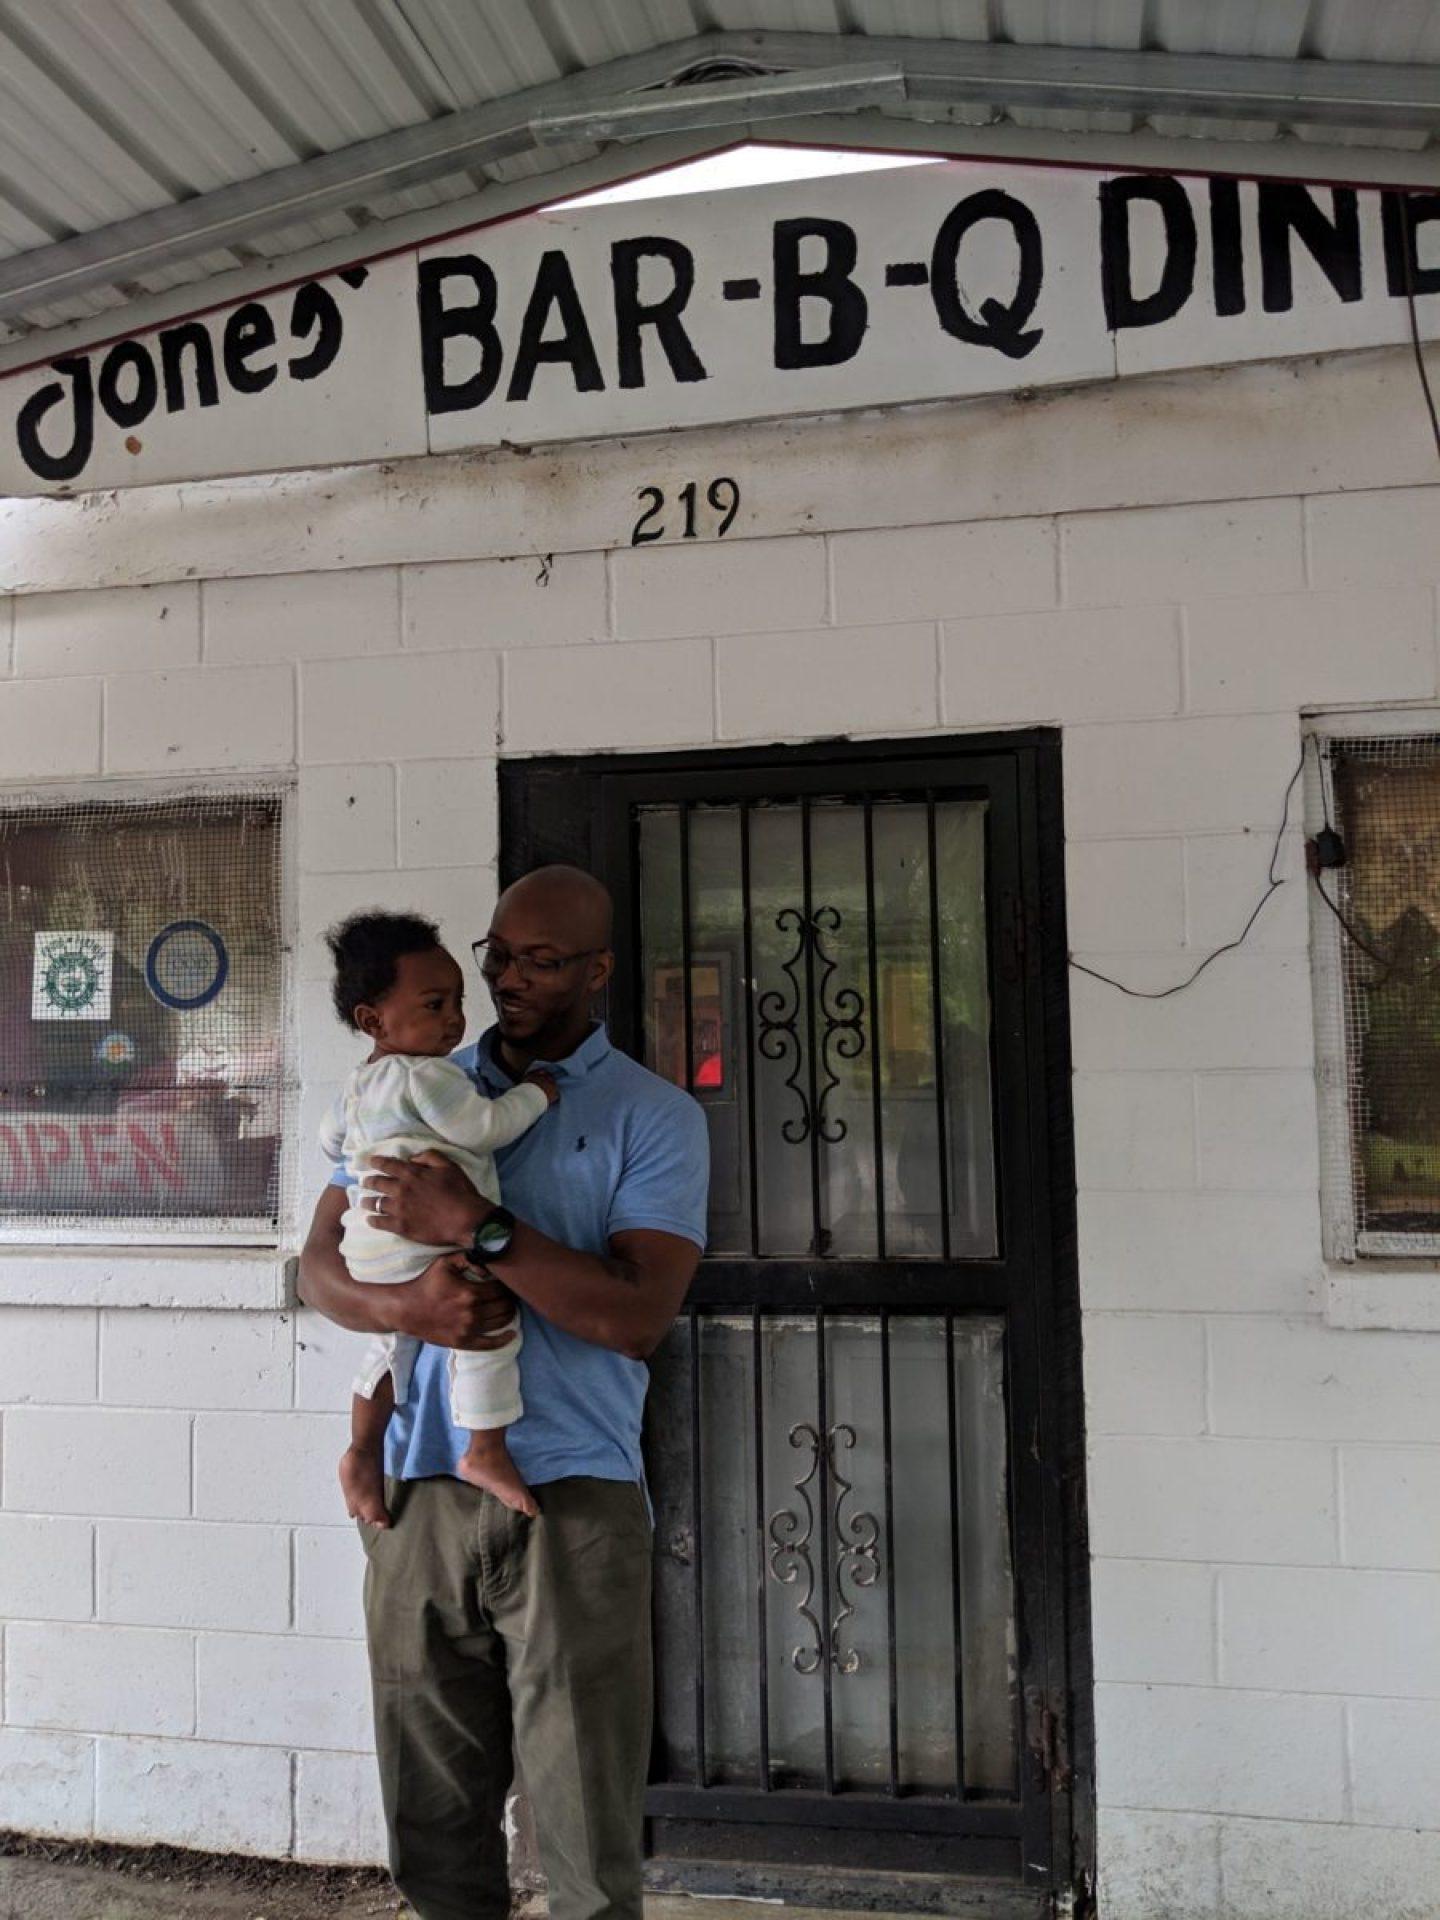 MVIMG_20190503_123454-1440x1920 Arkansas Delta Family Road Trip:  Black Heritage, Art & More!